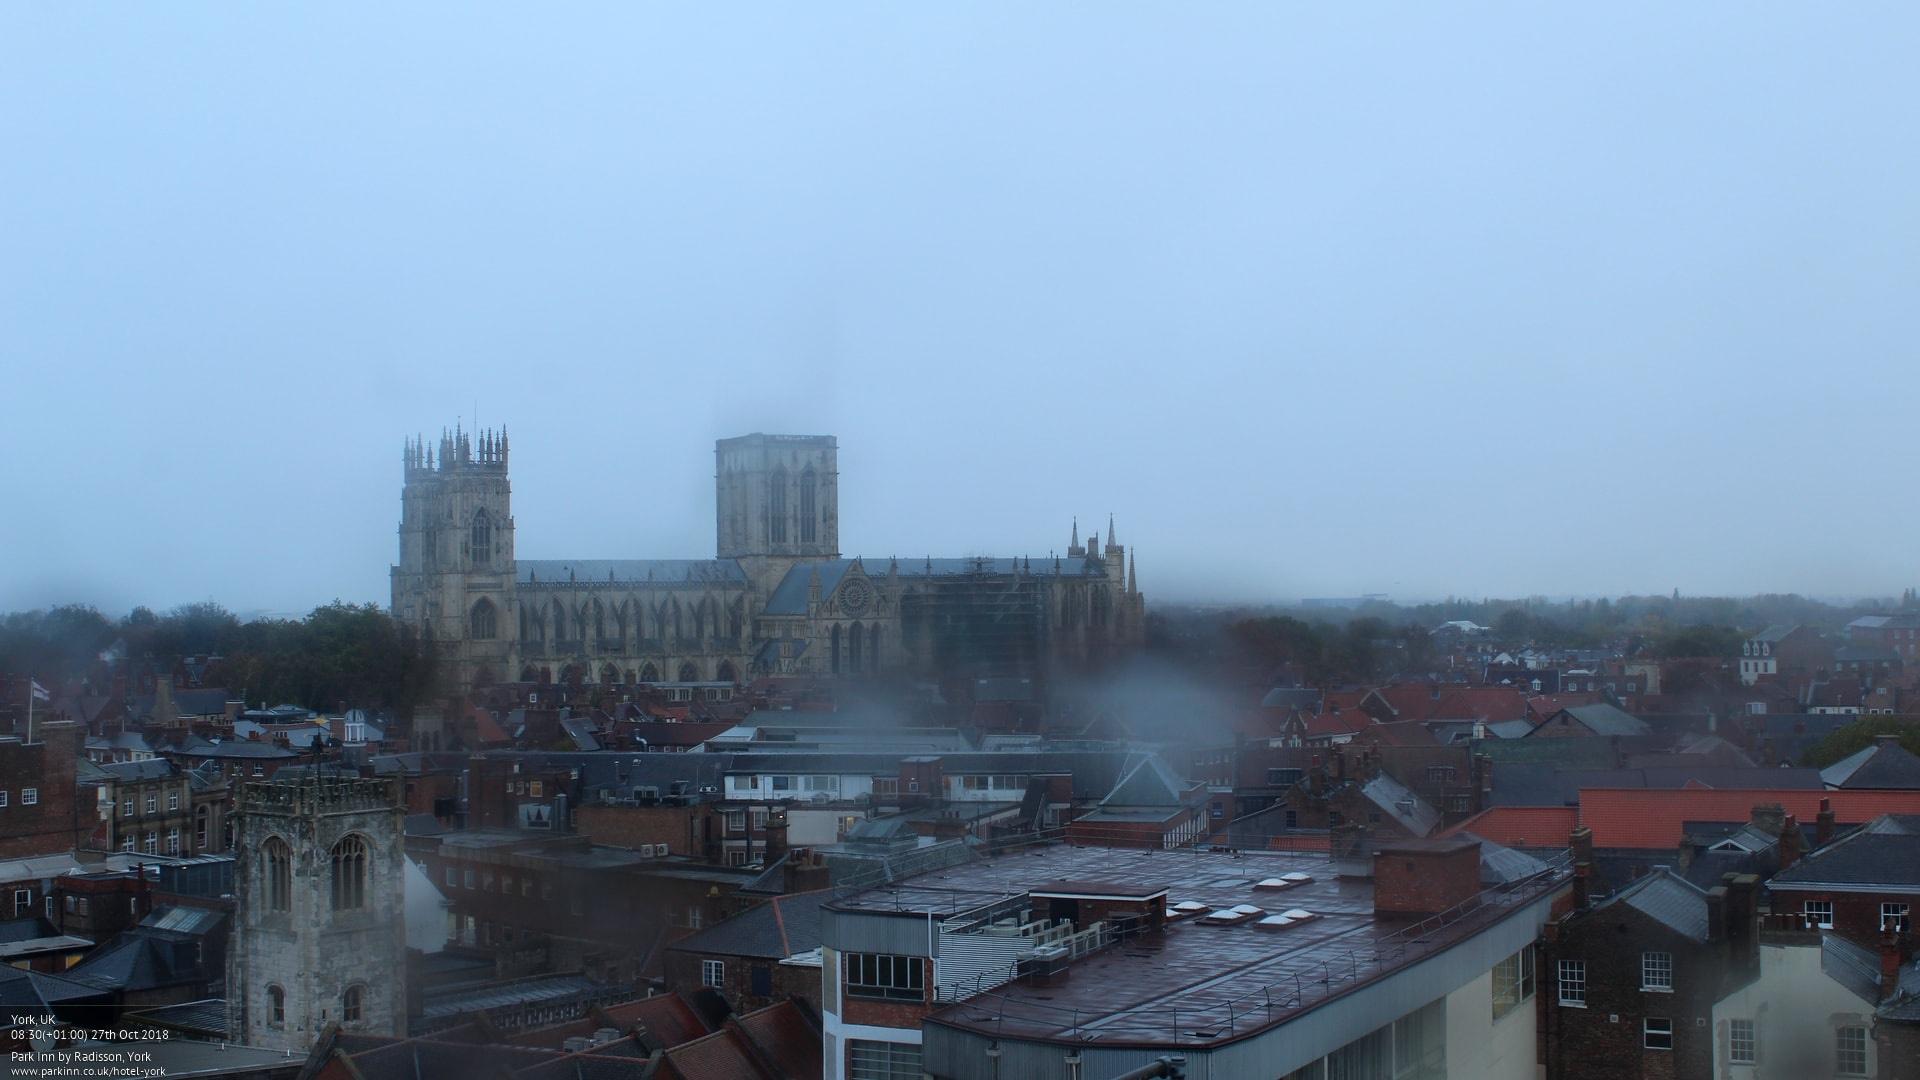 UK how's the weather like..-3549ba38-9beb-4a43-a273-ee4bda755ede-651-00000066085bc25a.jpg